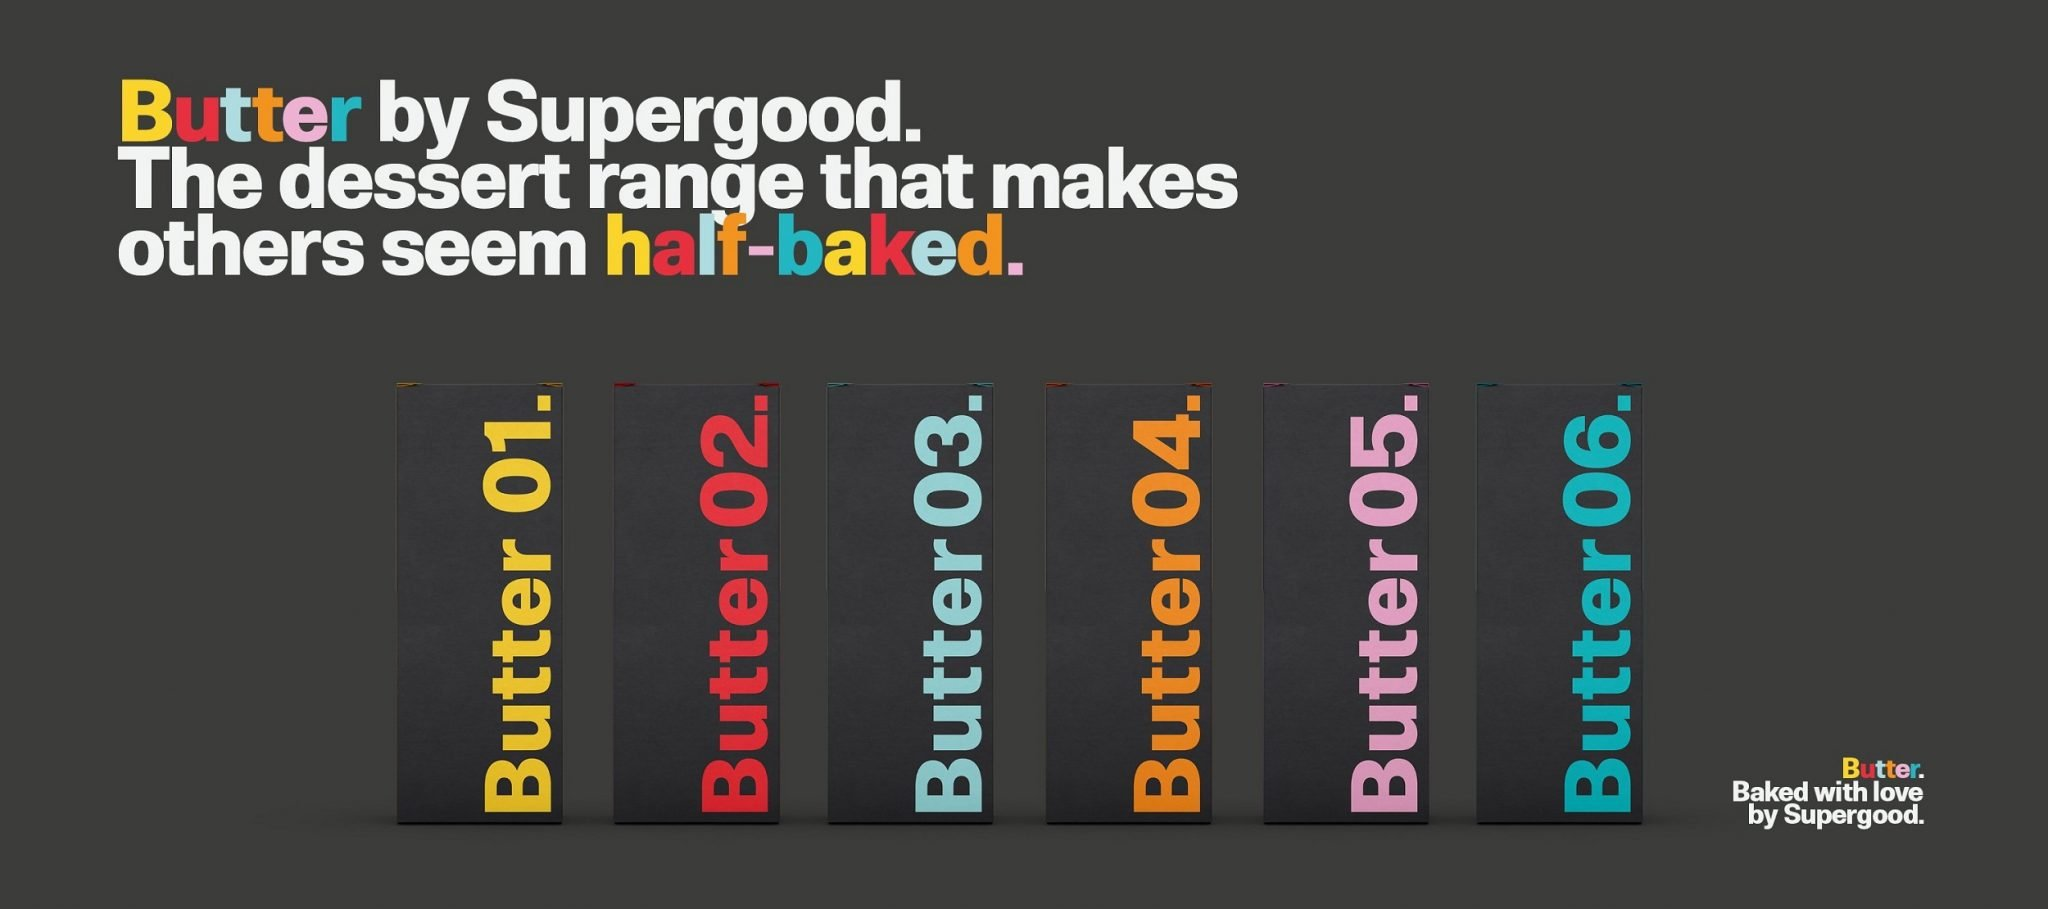 Supergood Butter eLiquid banner UK